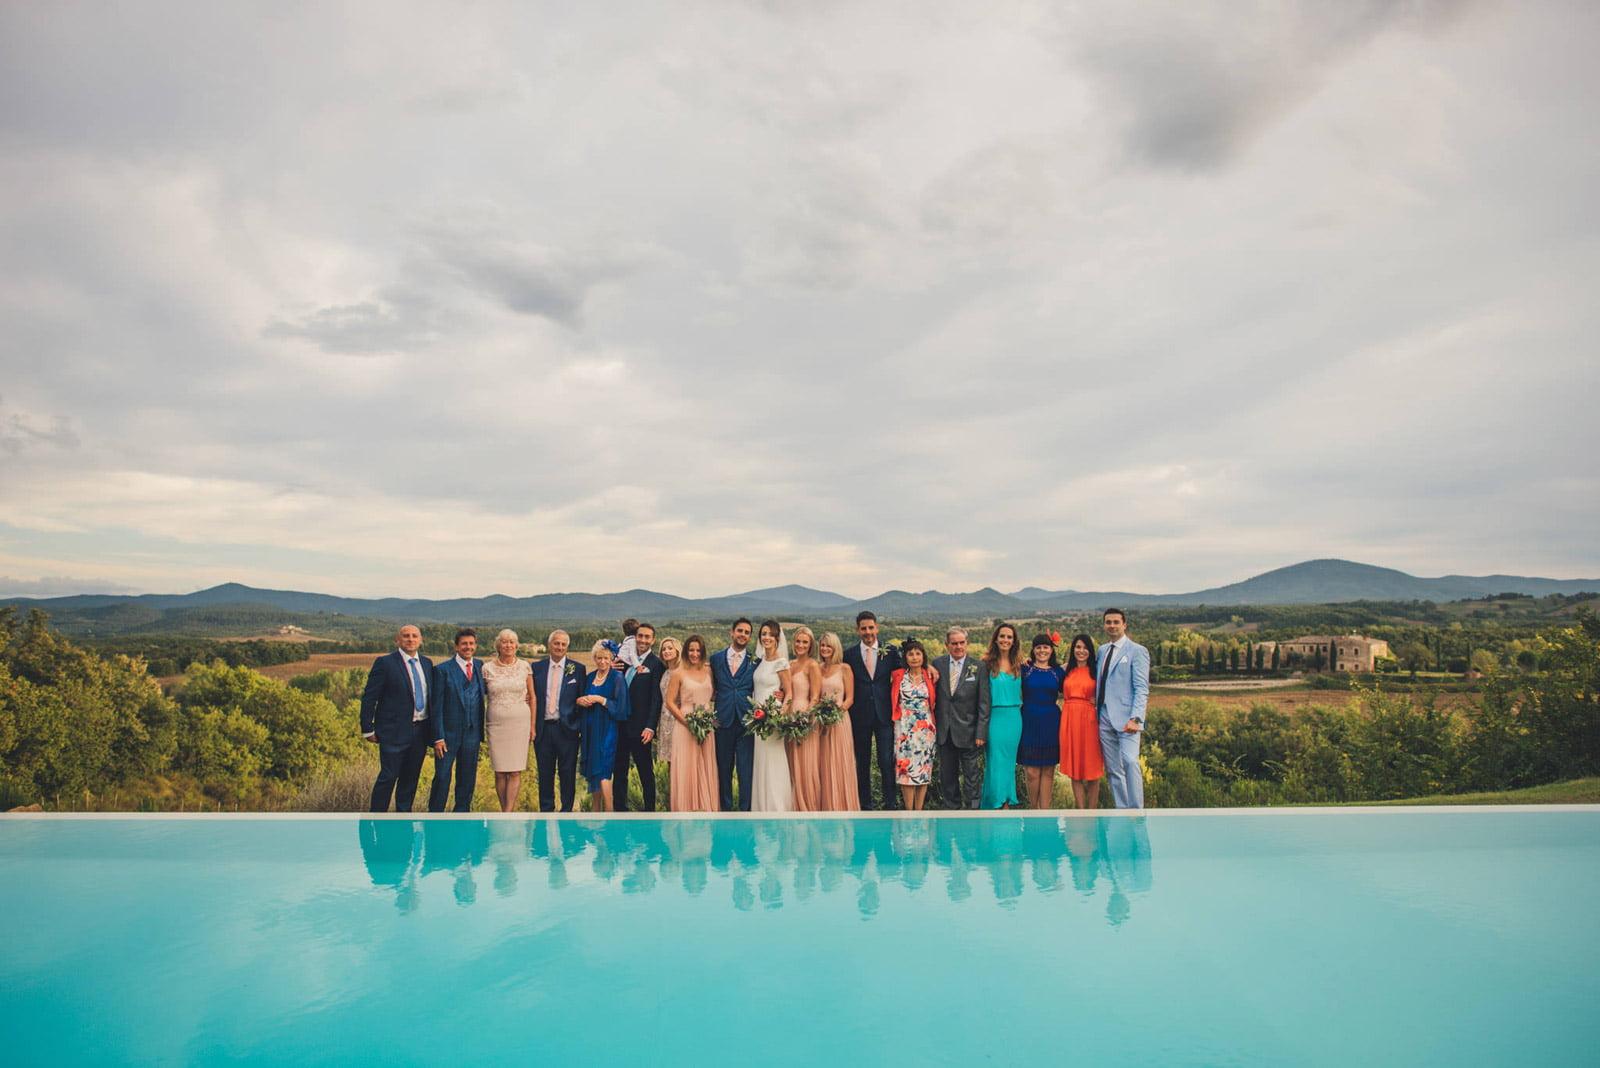 083-wedding-tuscany-san-galgano-federico-pannacci-photographer